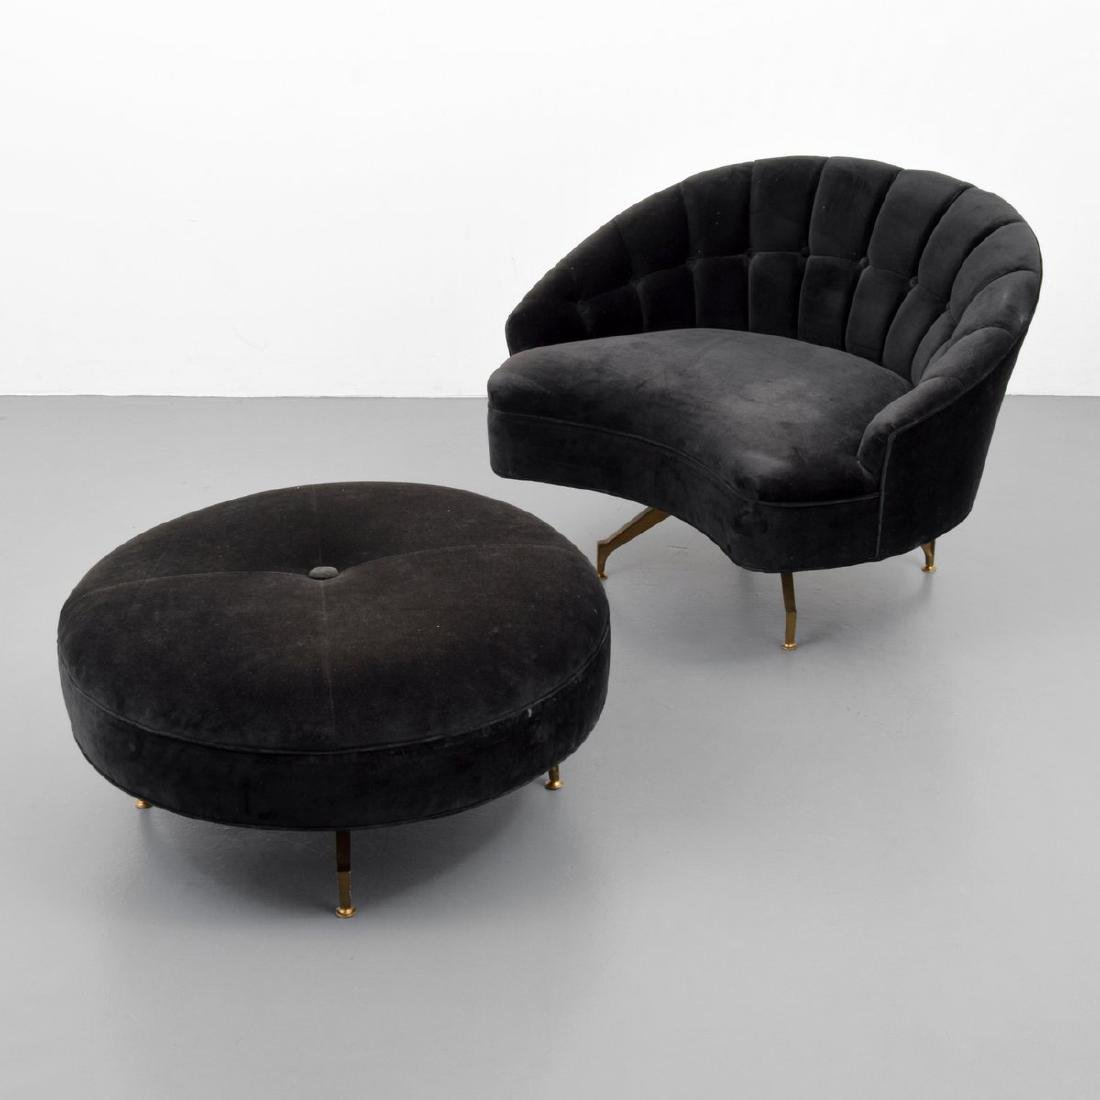 Lounge Chair & Ottoman, Manner of Milo Baughman